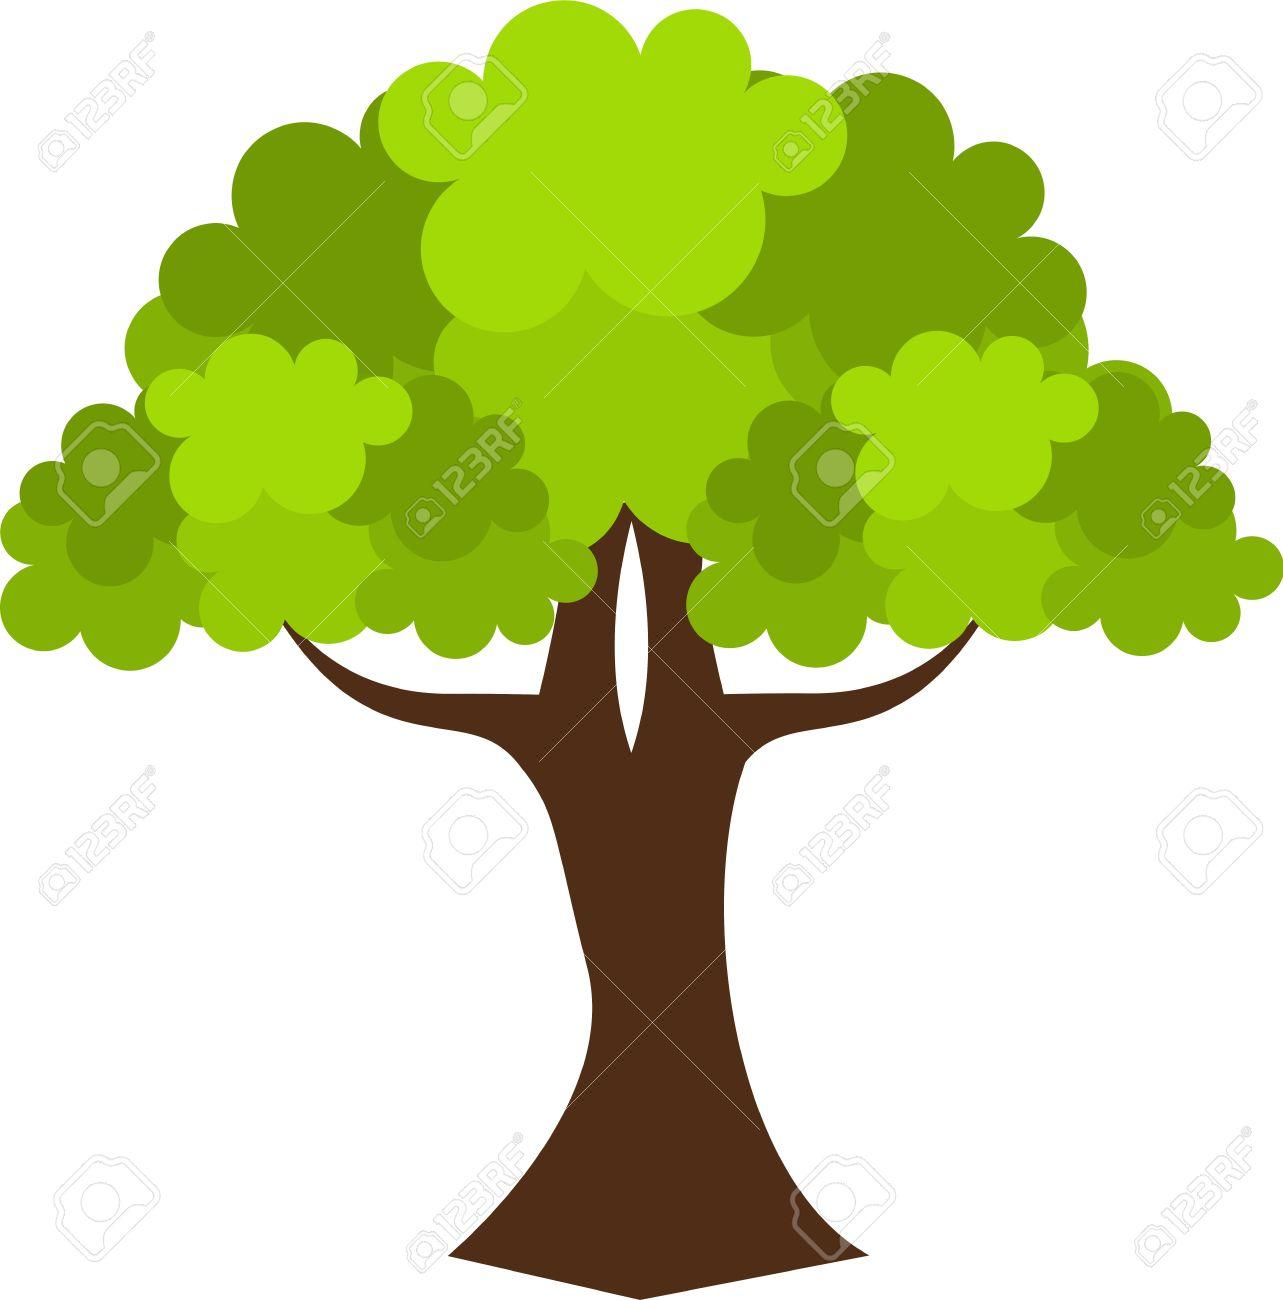 old oak tree vector illustration royalty free cliparts vectors rh 123rf com oak tree vector silhouette oak tree vector silhouette free